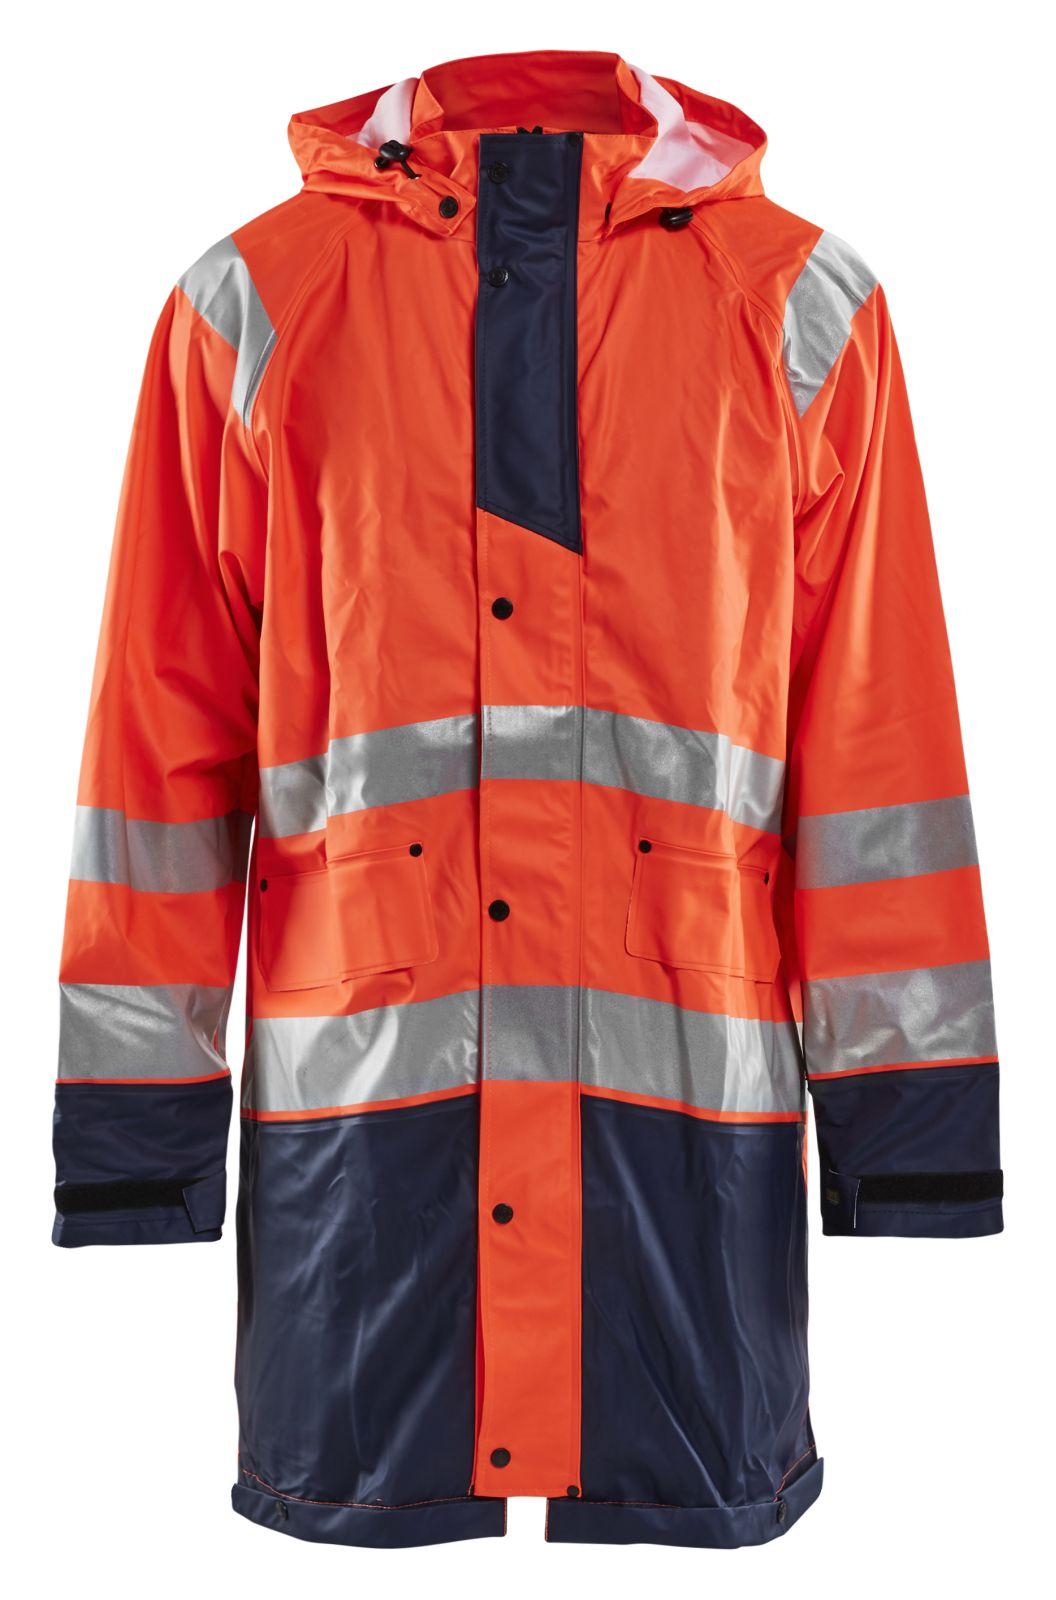 Blaklader Regenjassen 43242000 High Vis oranje-marineblauw(5389)